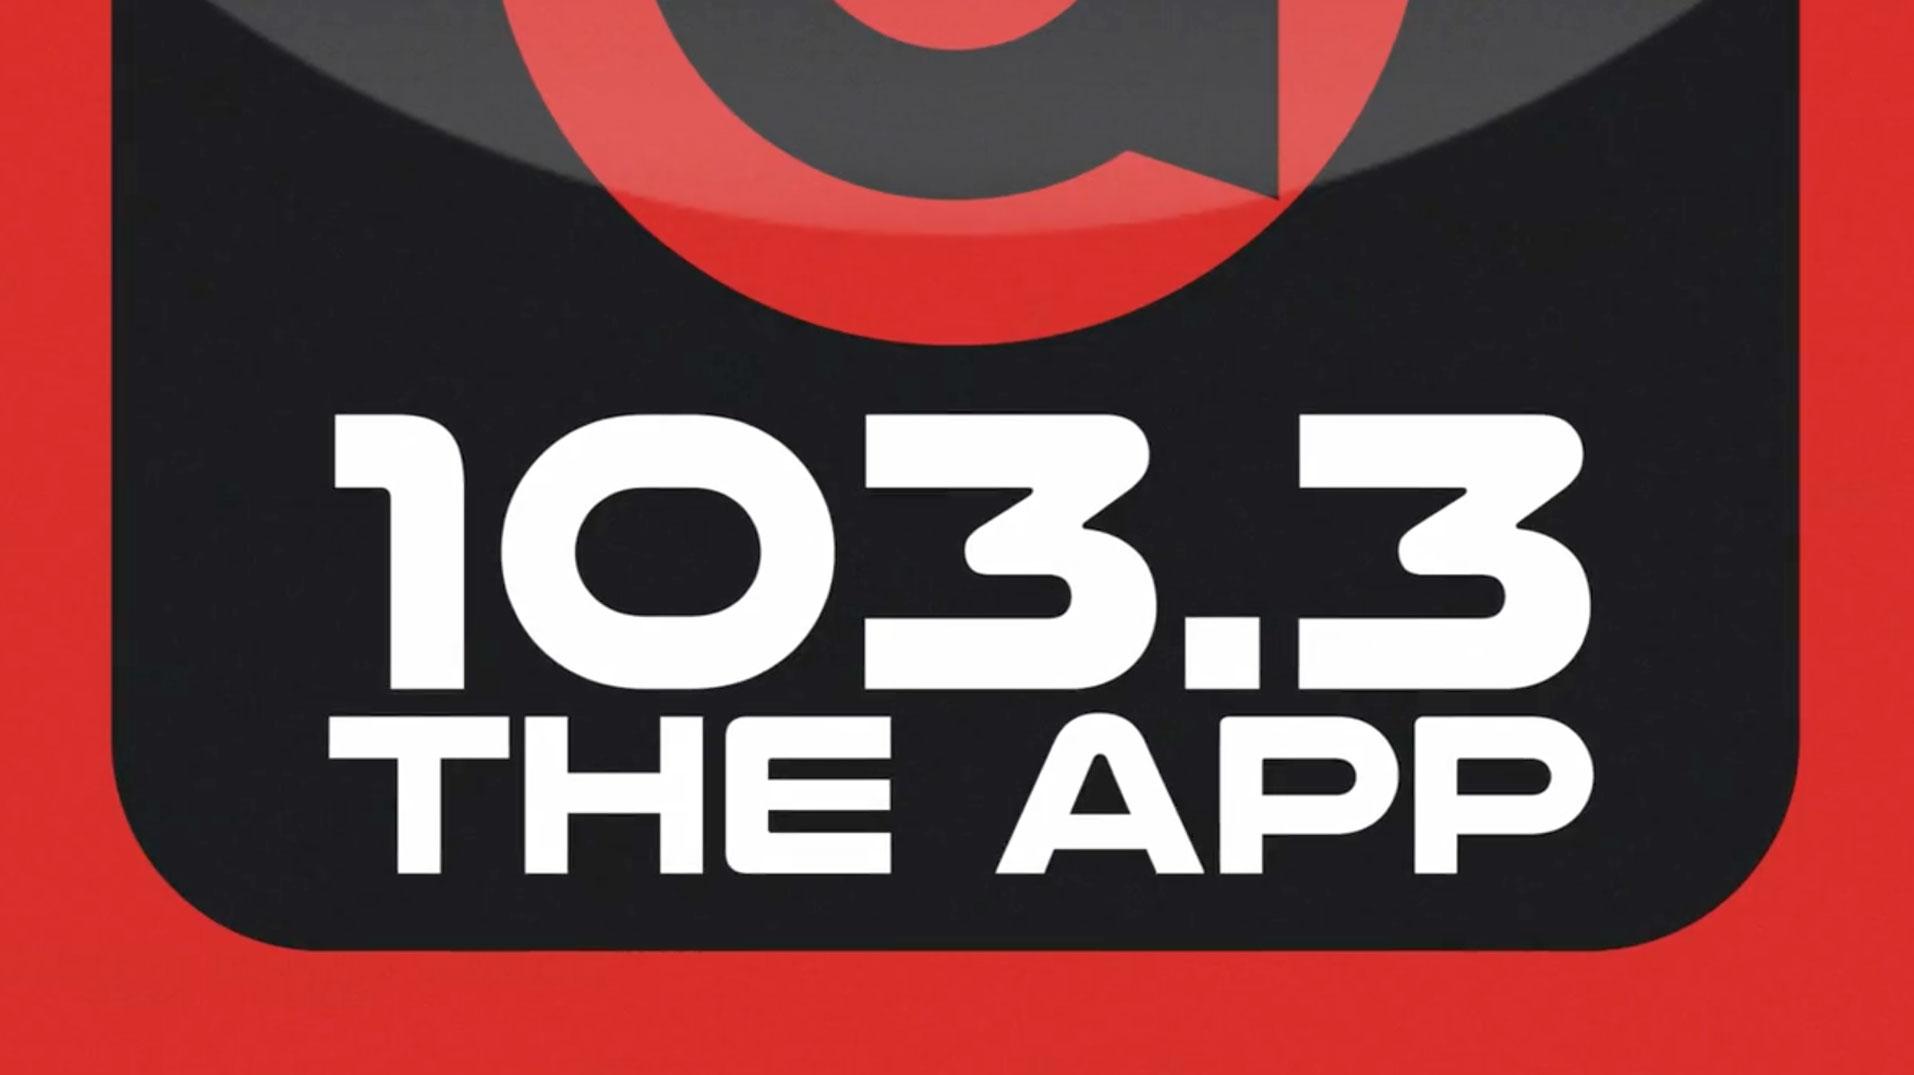 1033 The App